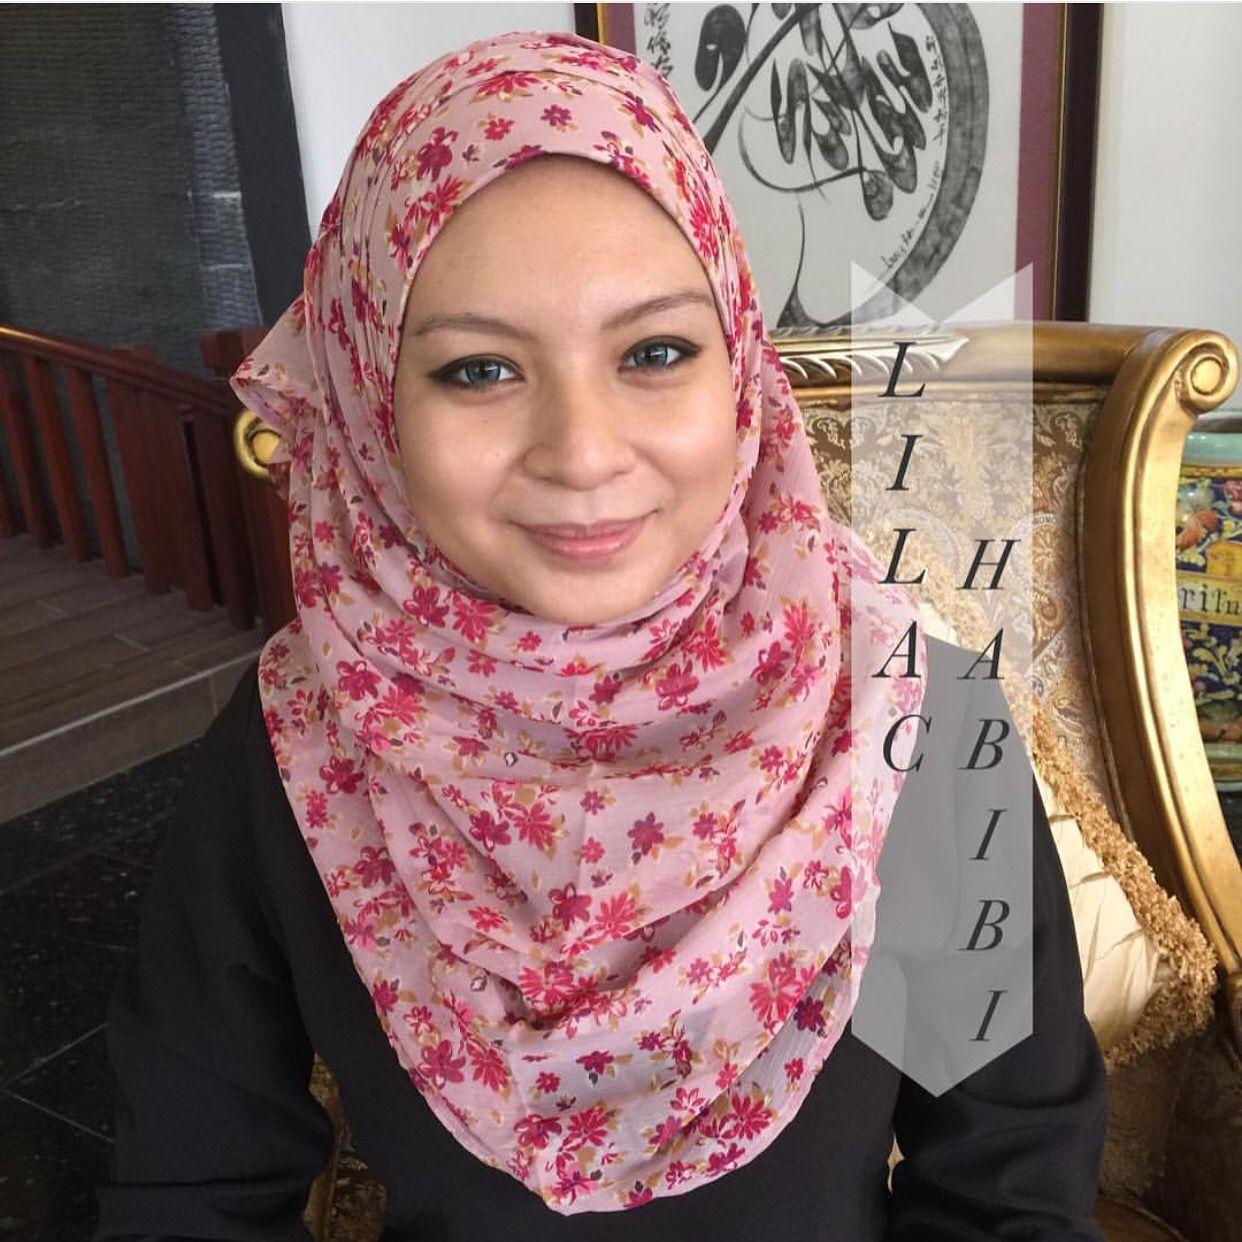 Bokitta Hijab Follow instagram: Bokitta_pinfreehijab Bokitta